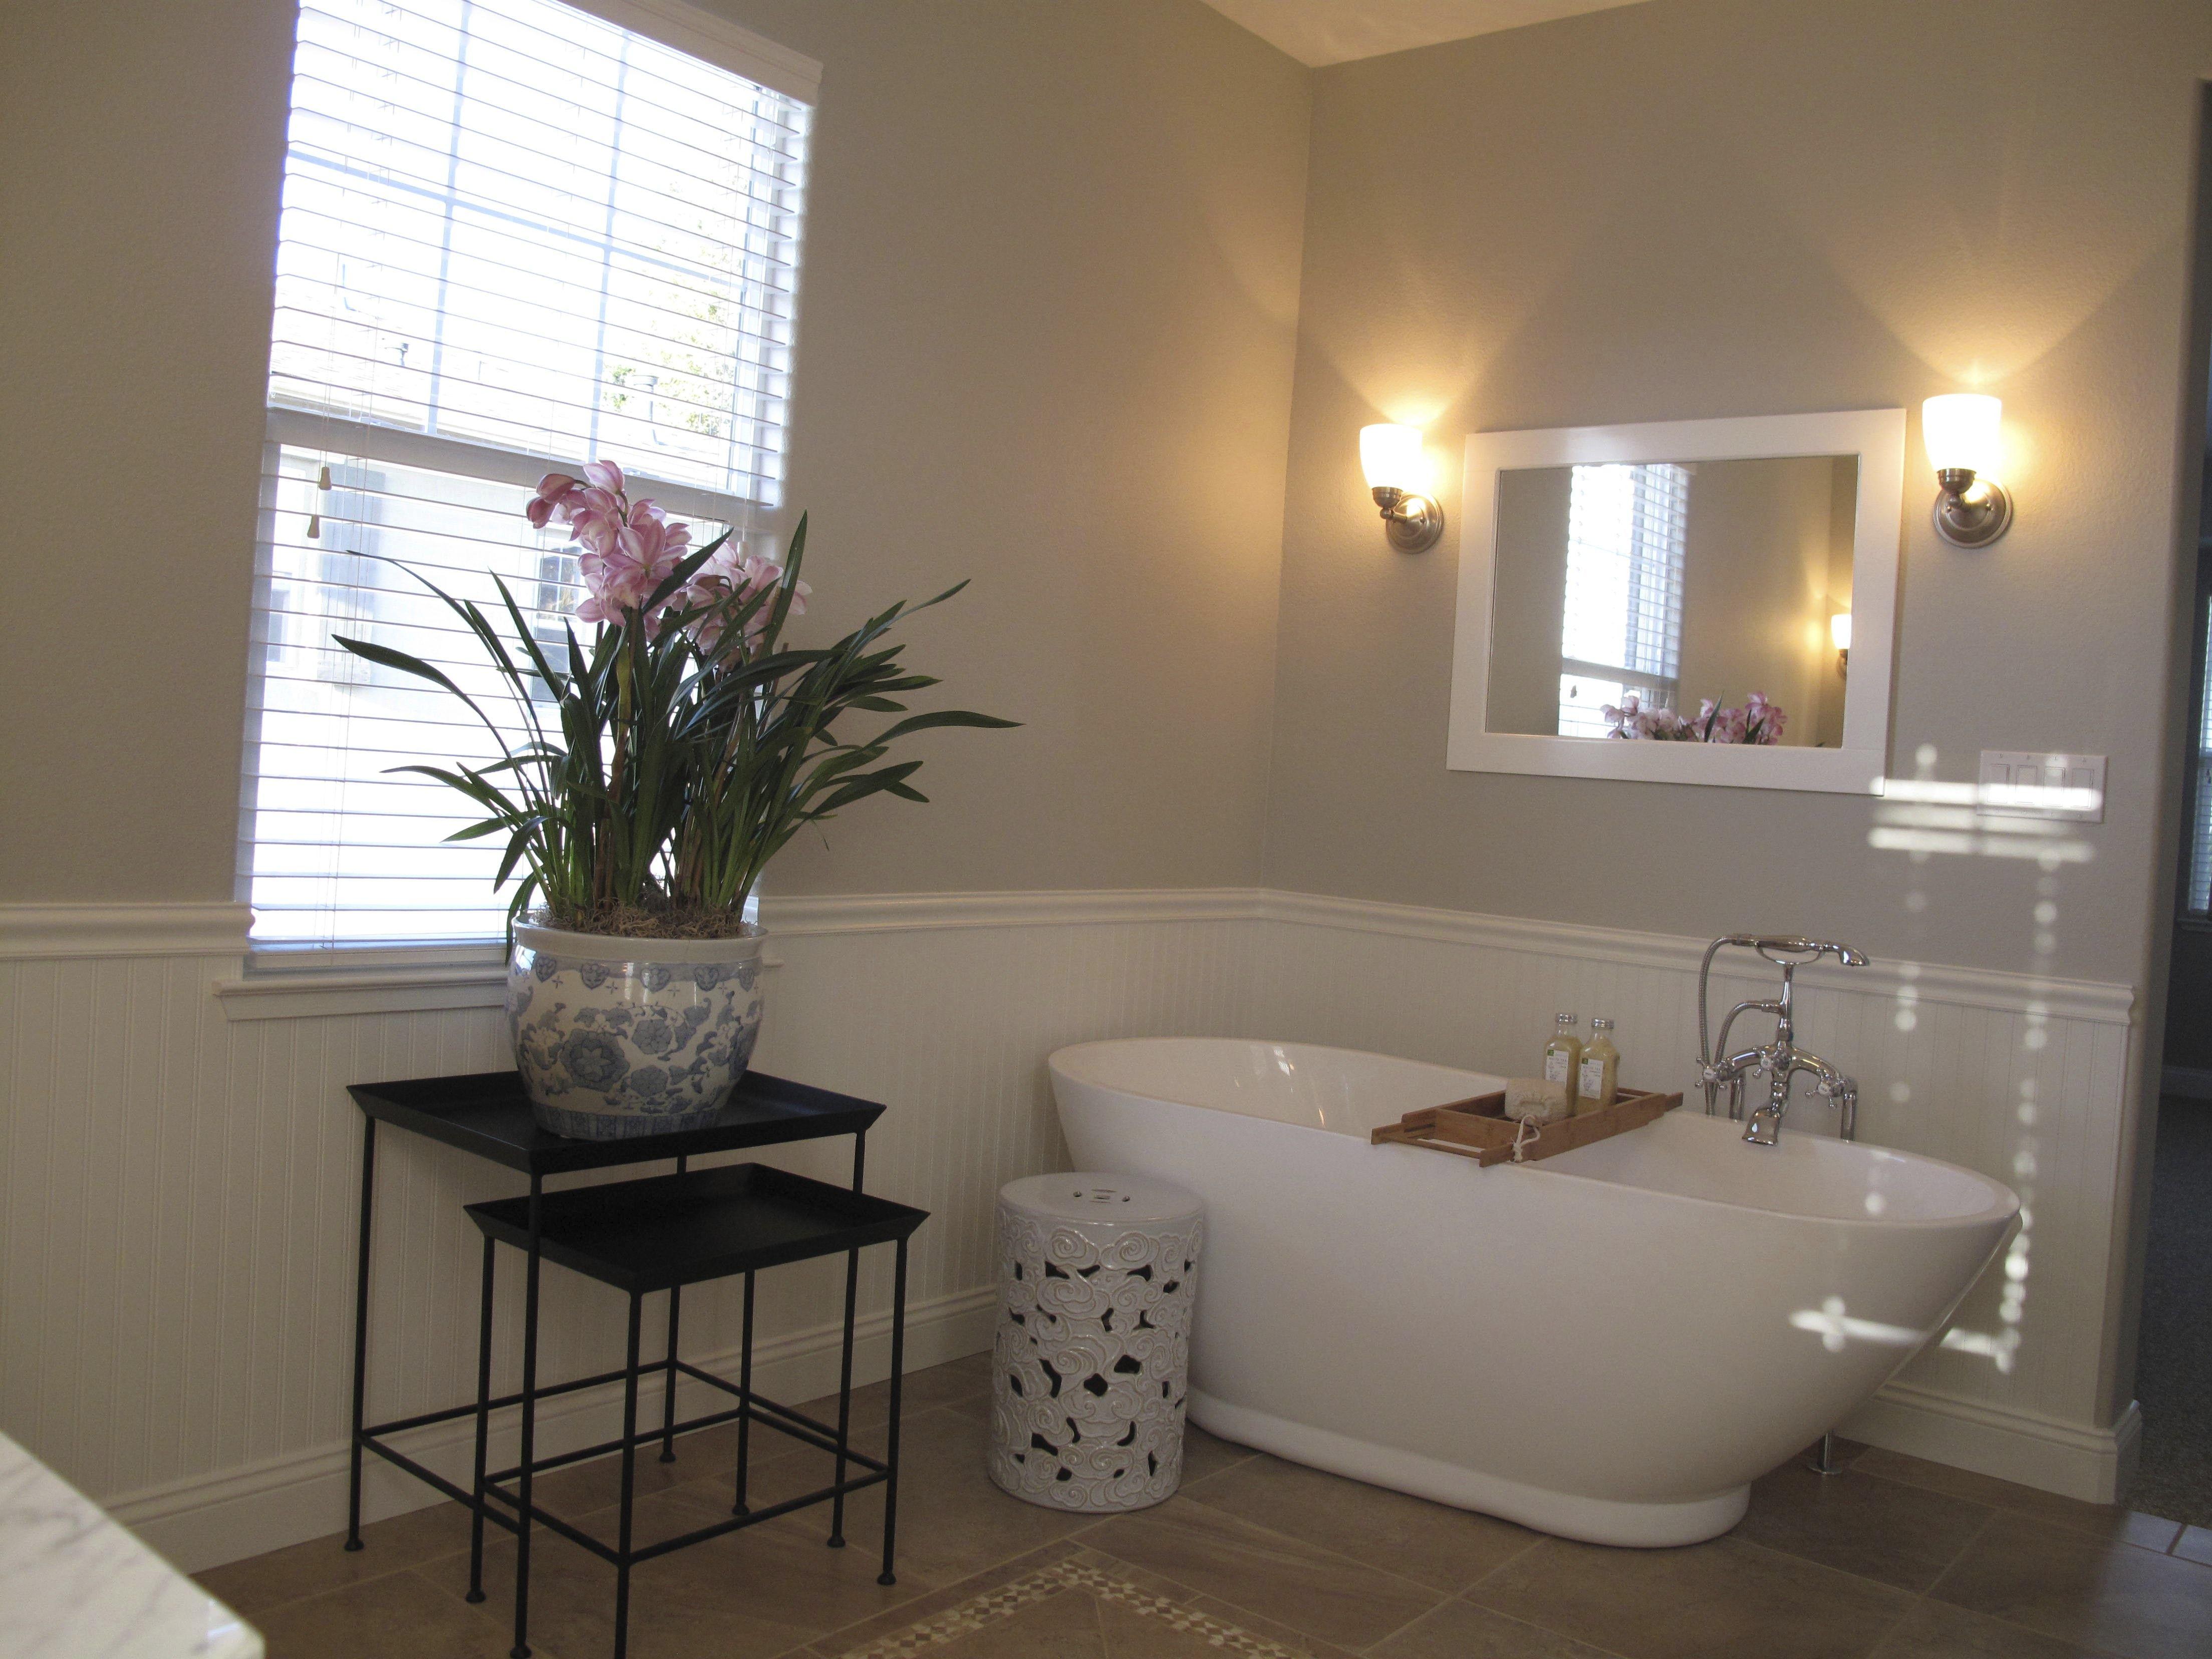 Leslie S Tub Faucet Placement Free Standing Tub Tub Faucet Tub